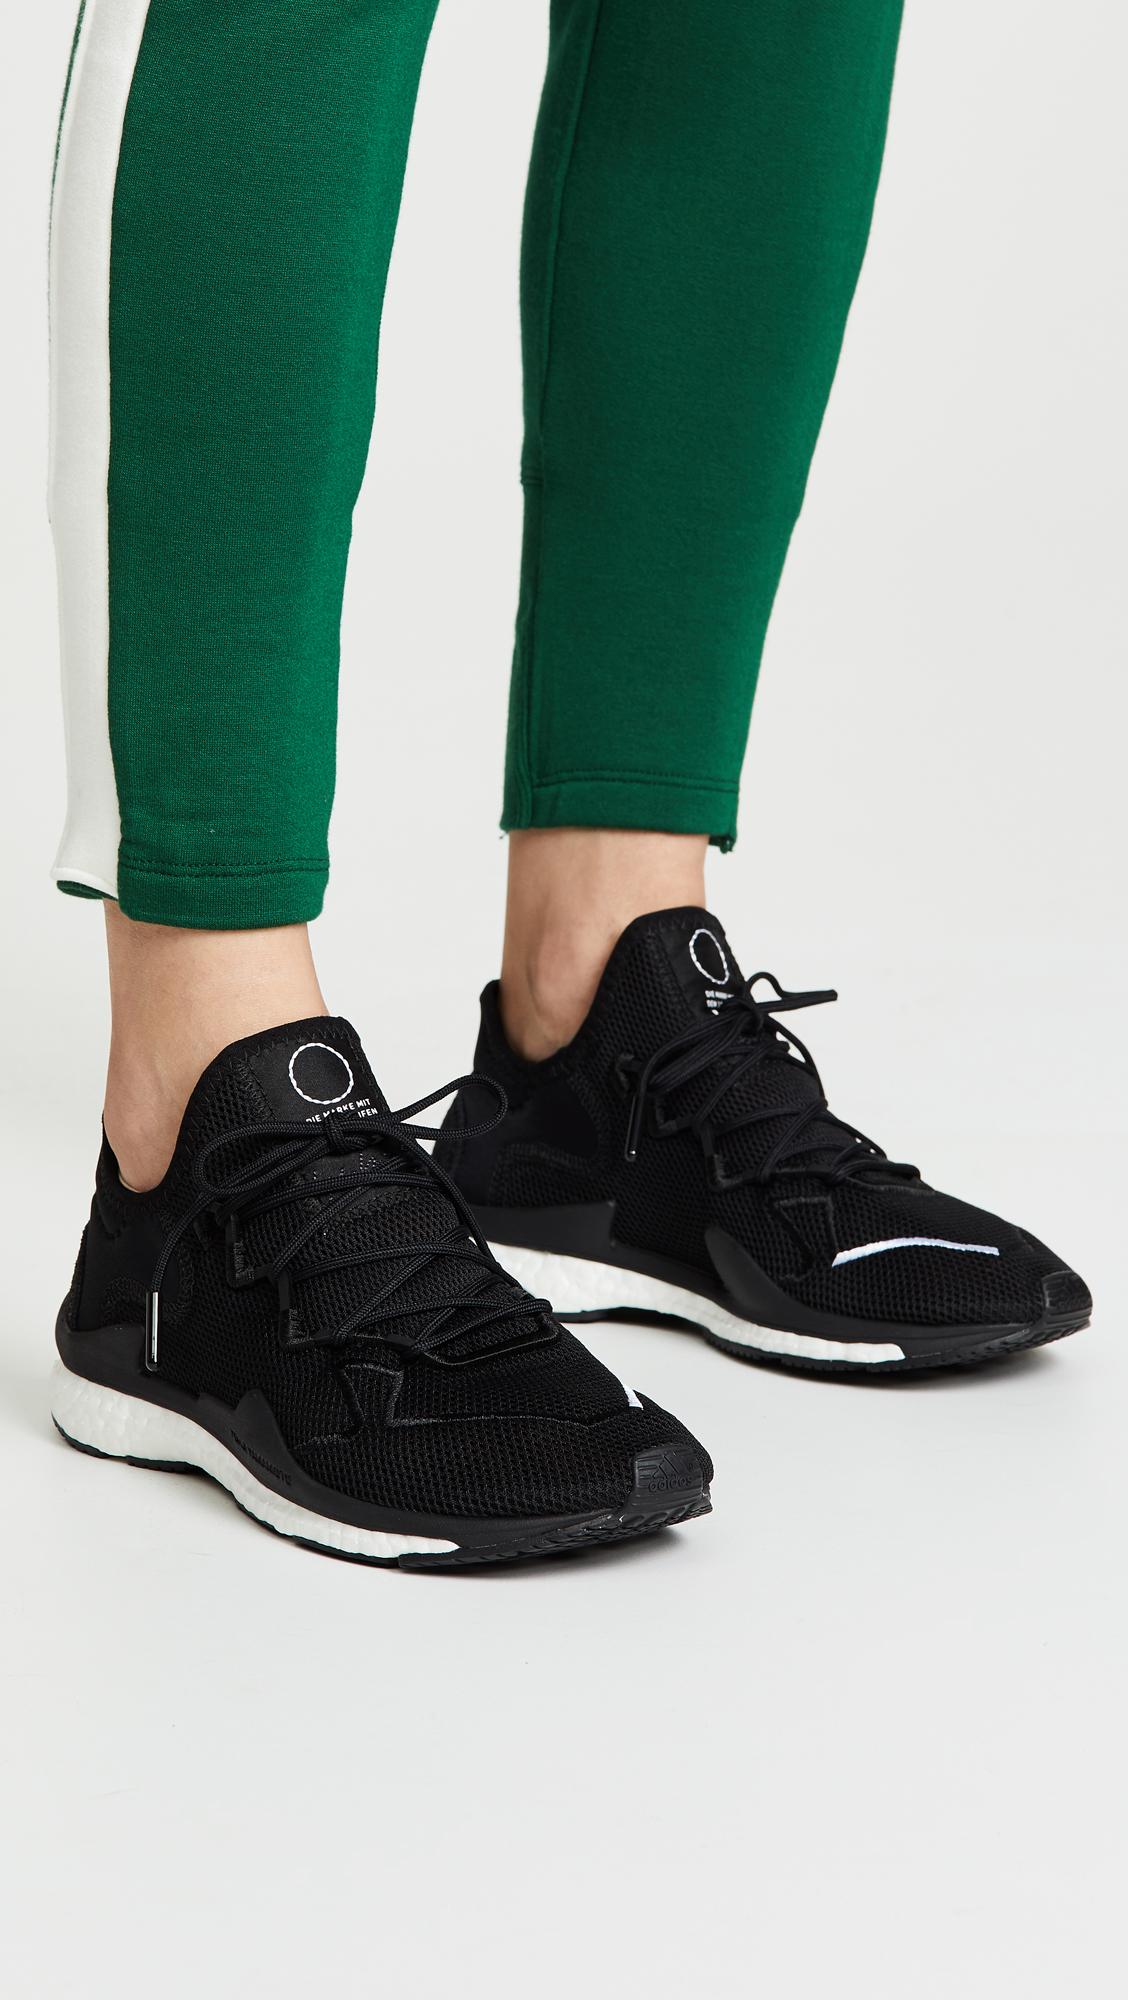 c8ba22b47b1f Y-3 Y-3 Adizero Runner Sneakers